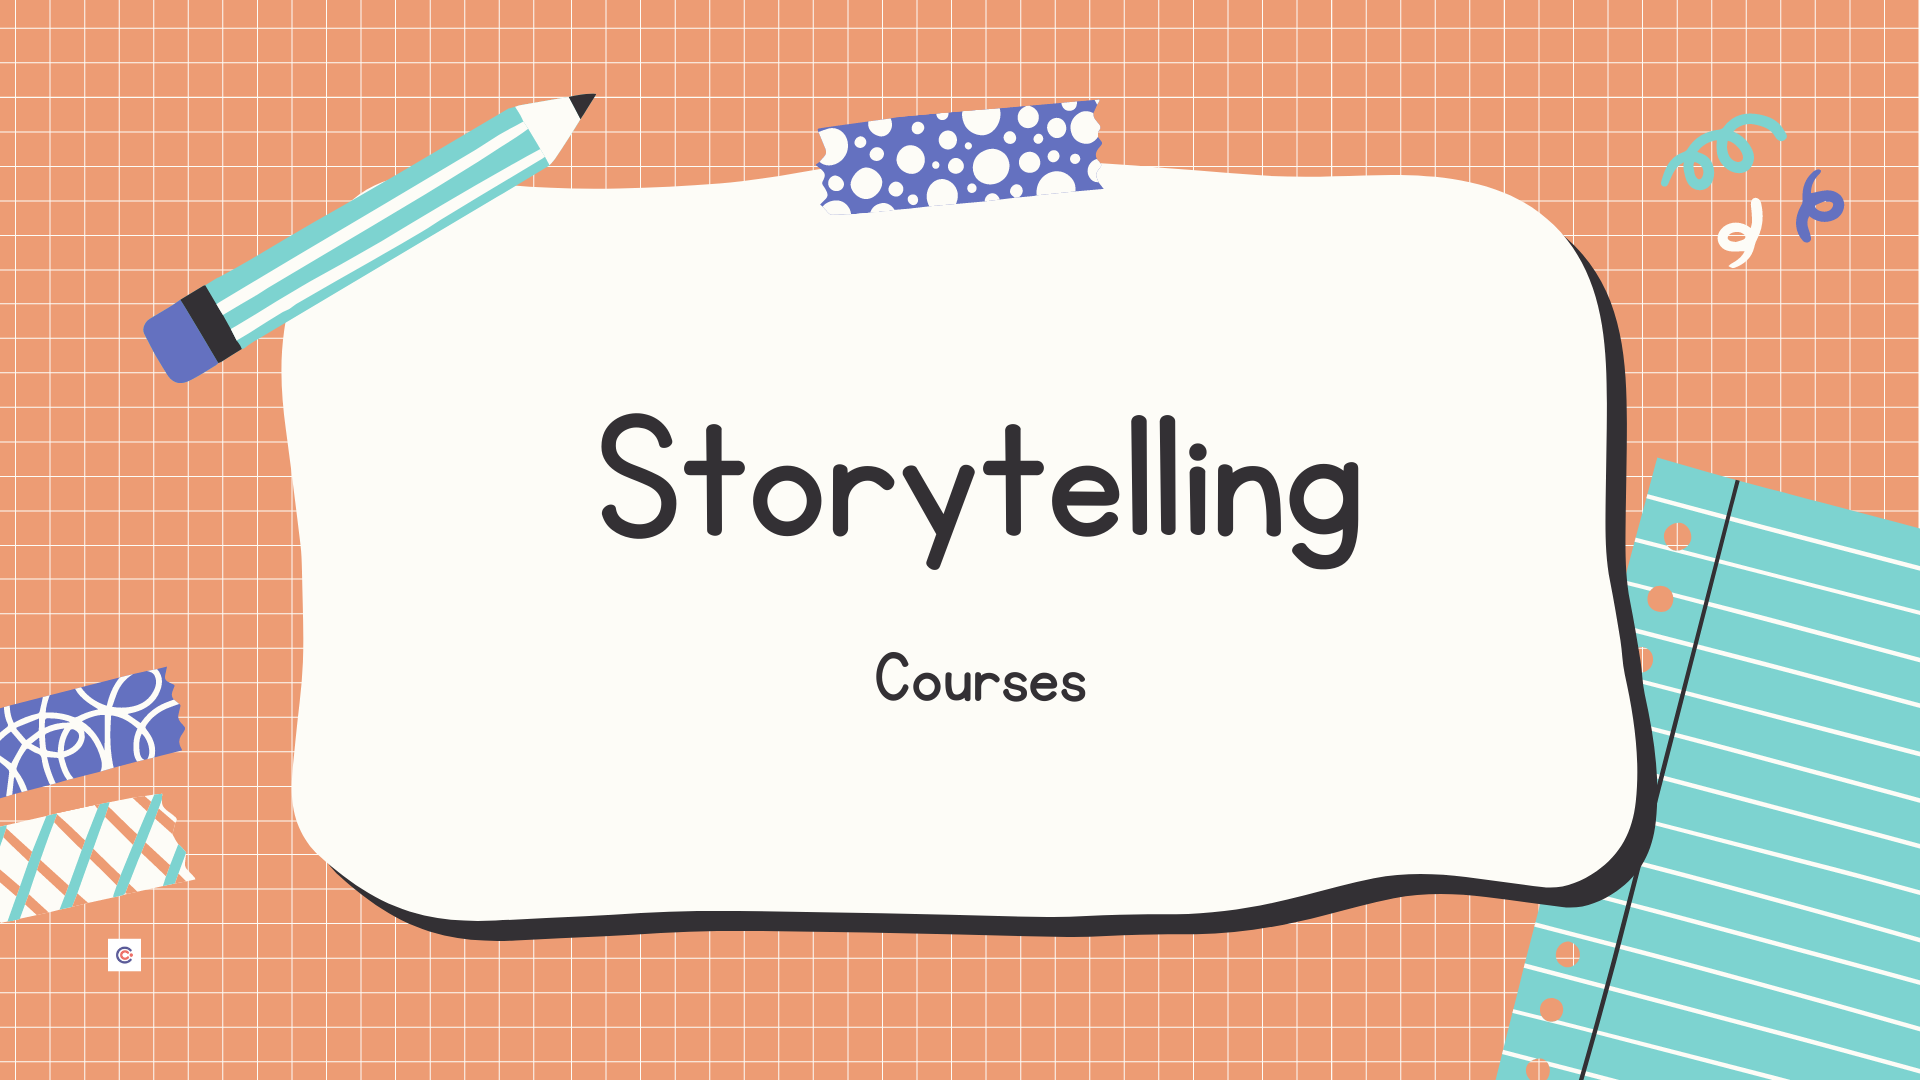 7 Best Storytelling Courses - Learn Storytelling Online